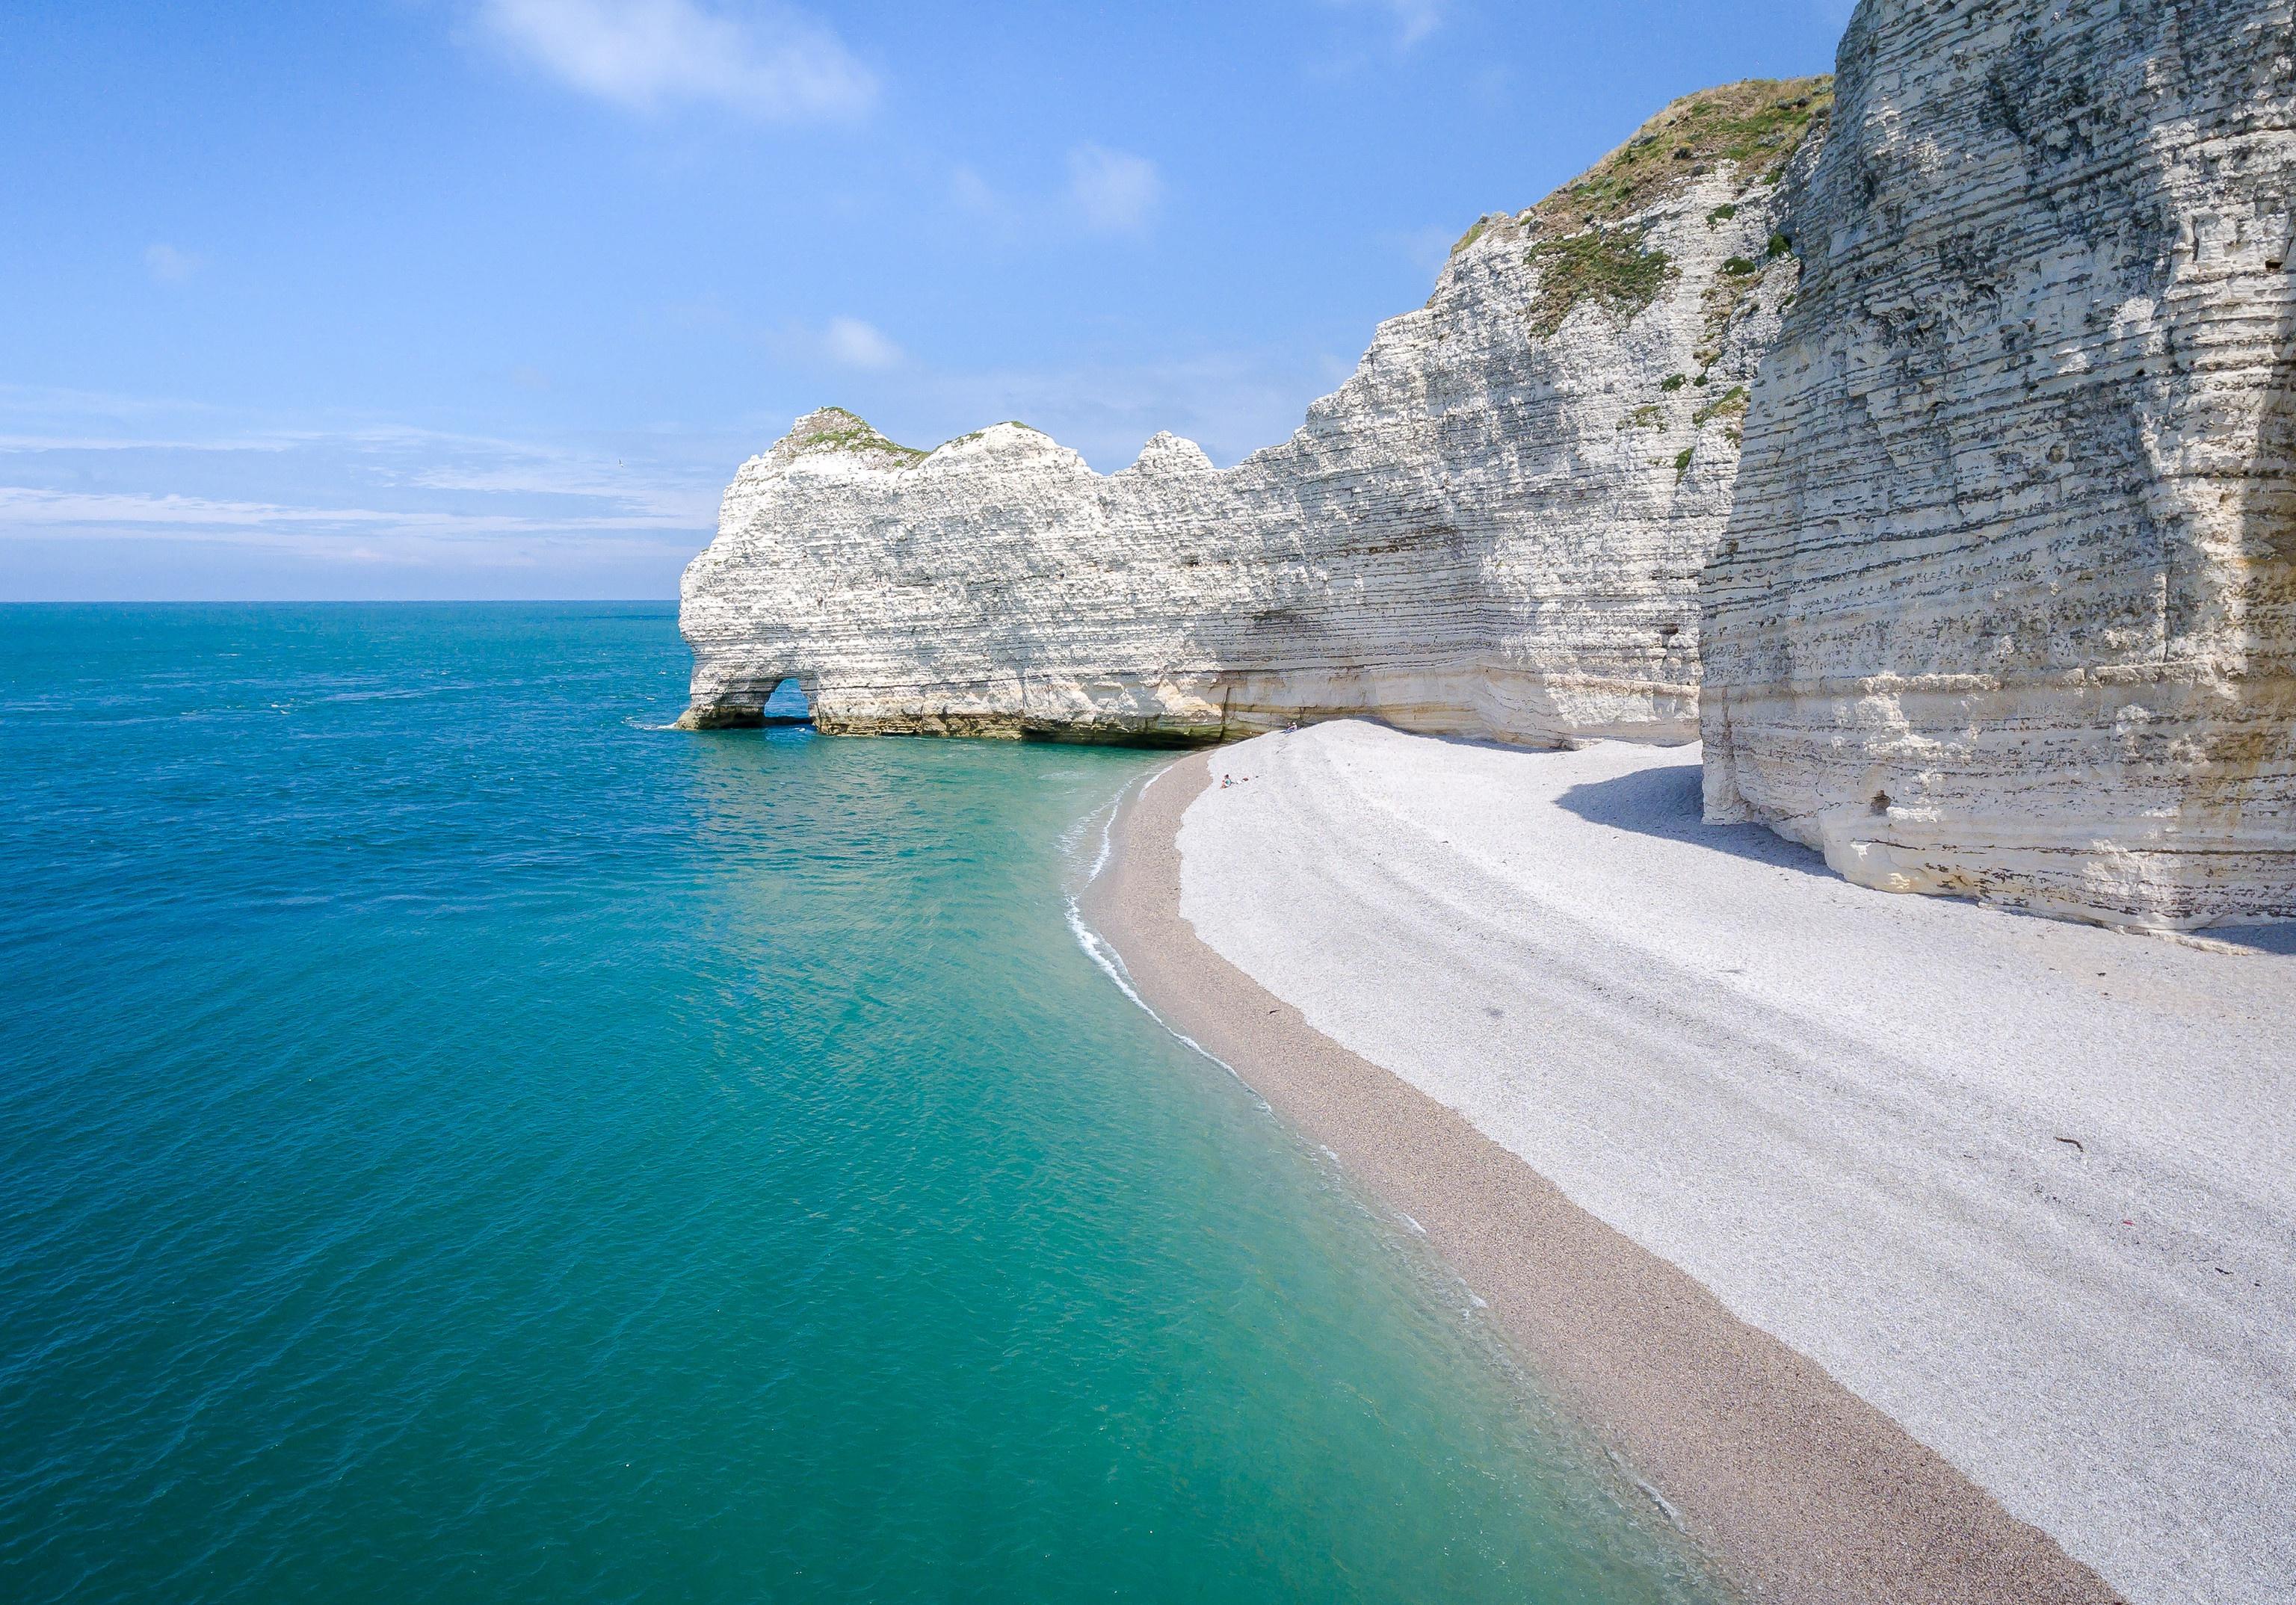 Beach Cliff Horizon Nature Ocean Sand 3072x2148